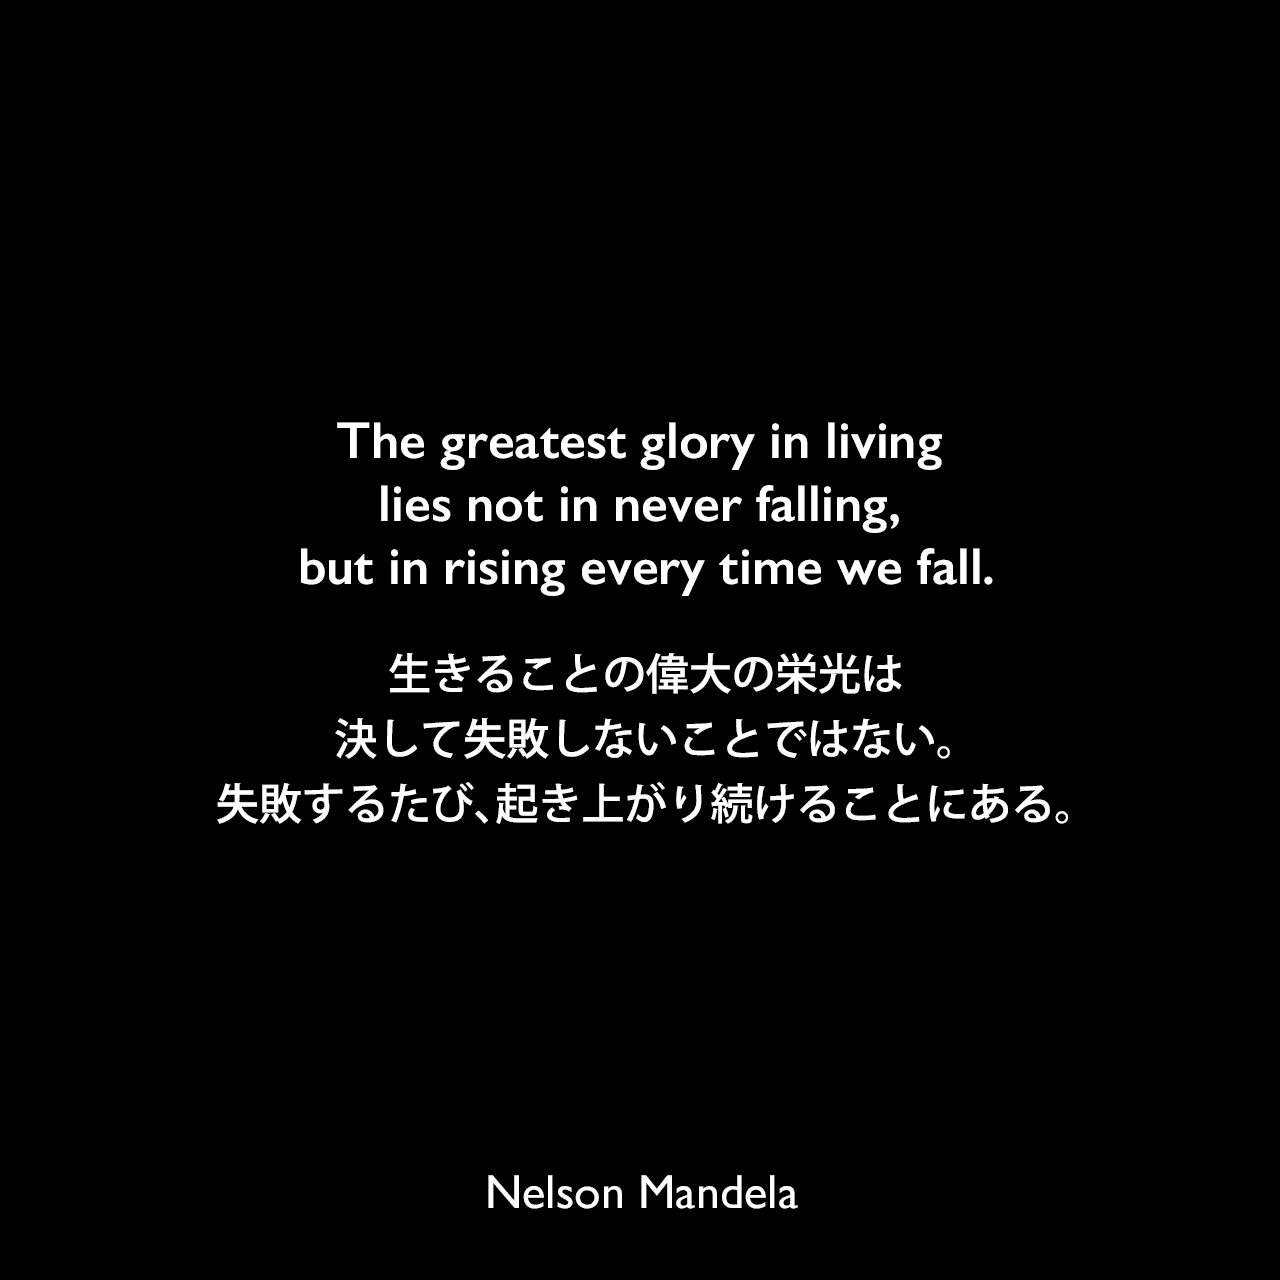 The greatest glory in living lies not in never falling, but in rising every time we fall.生きることの偉大の栄光は、決して失敗しないことではない。失敗するたび、起き上がり続けることにある。- ネルソン・マンデラによる本「自由への長い道 ネルソン・マンデラ自伝」より